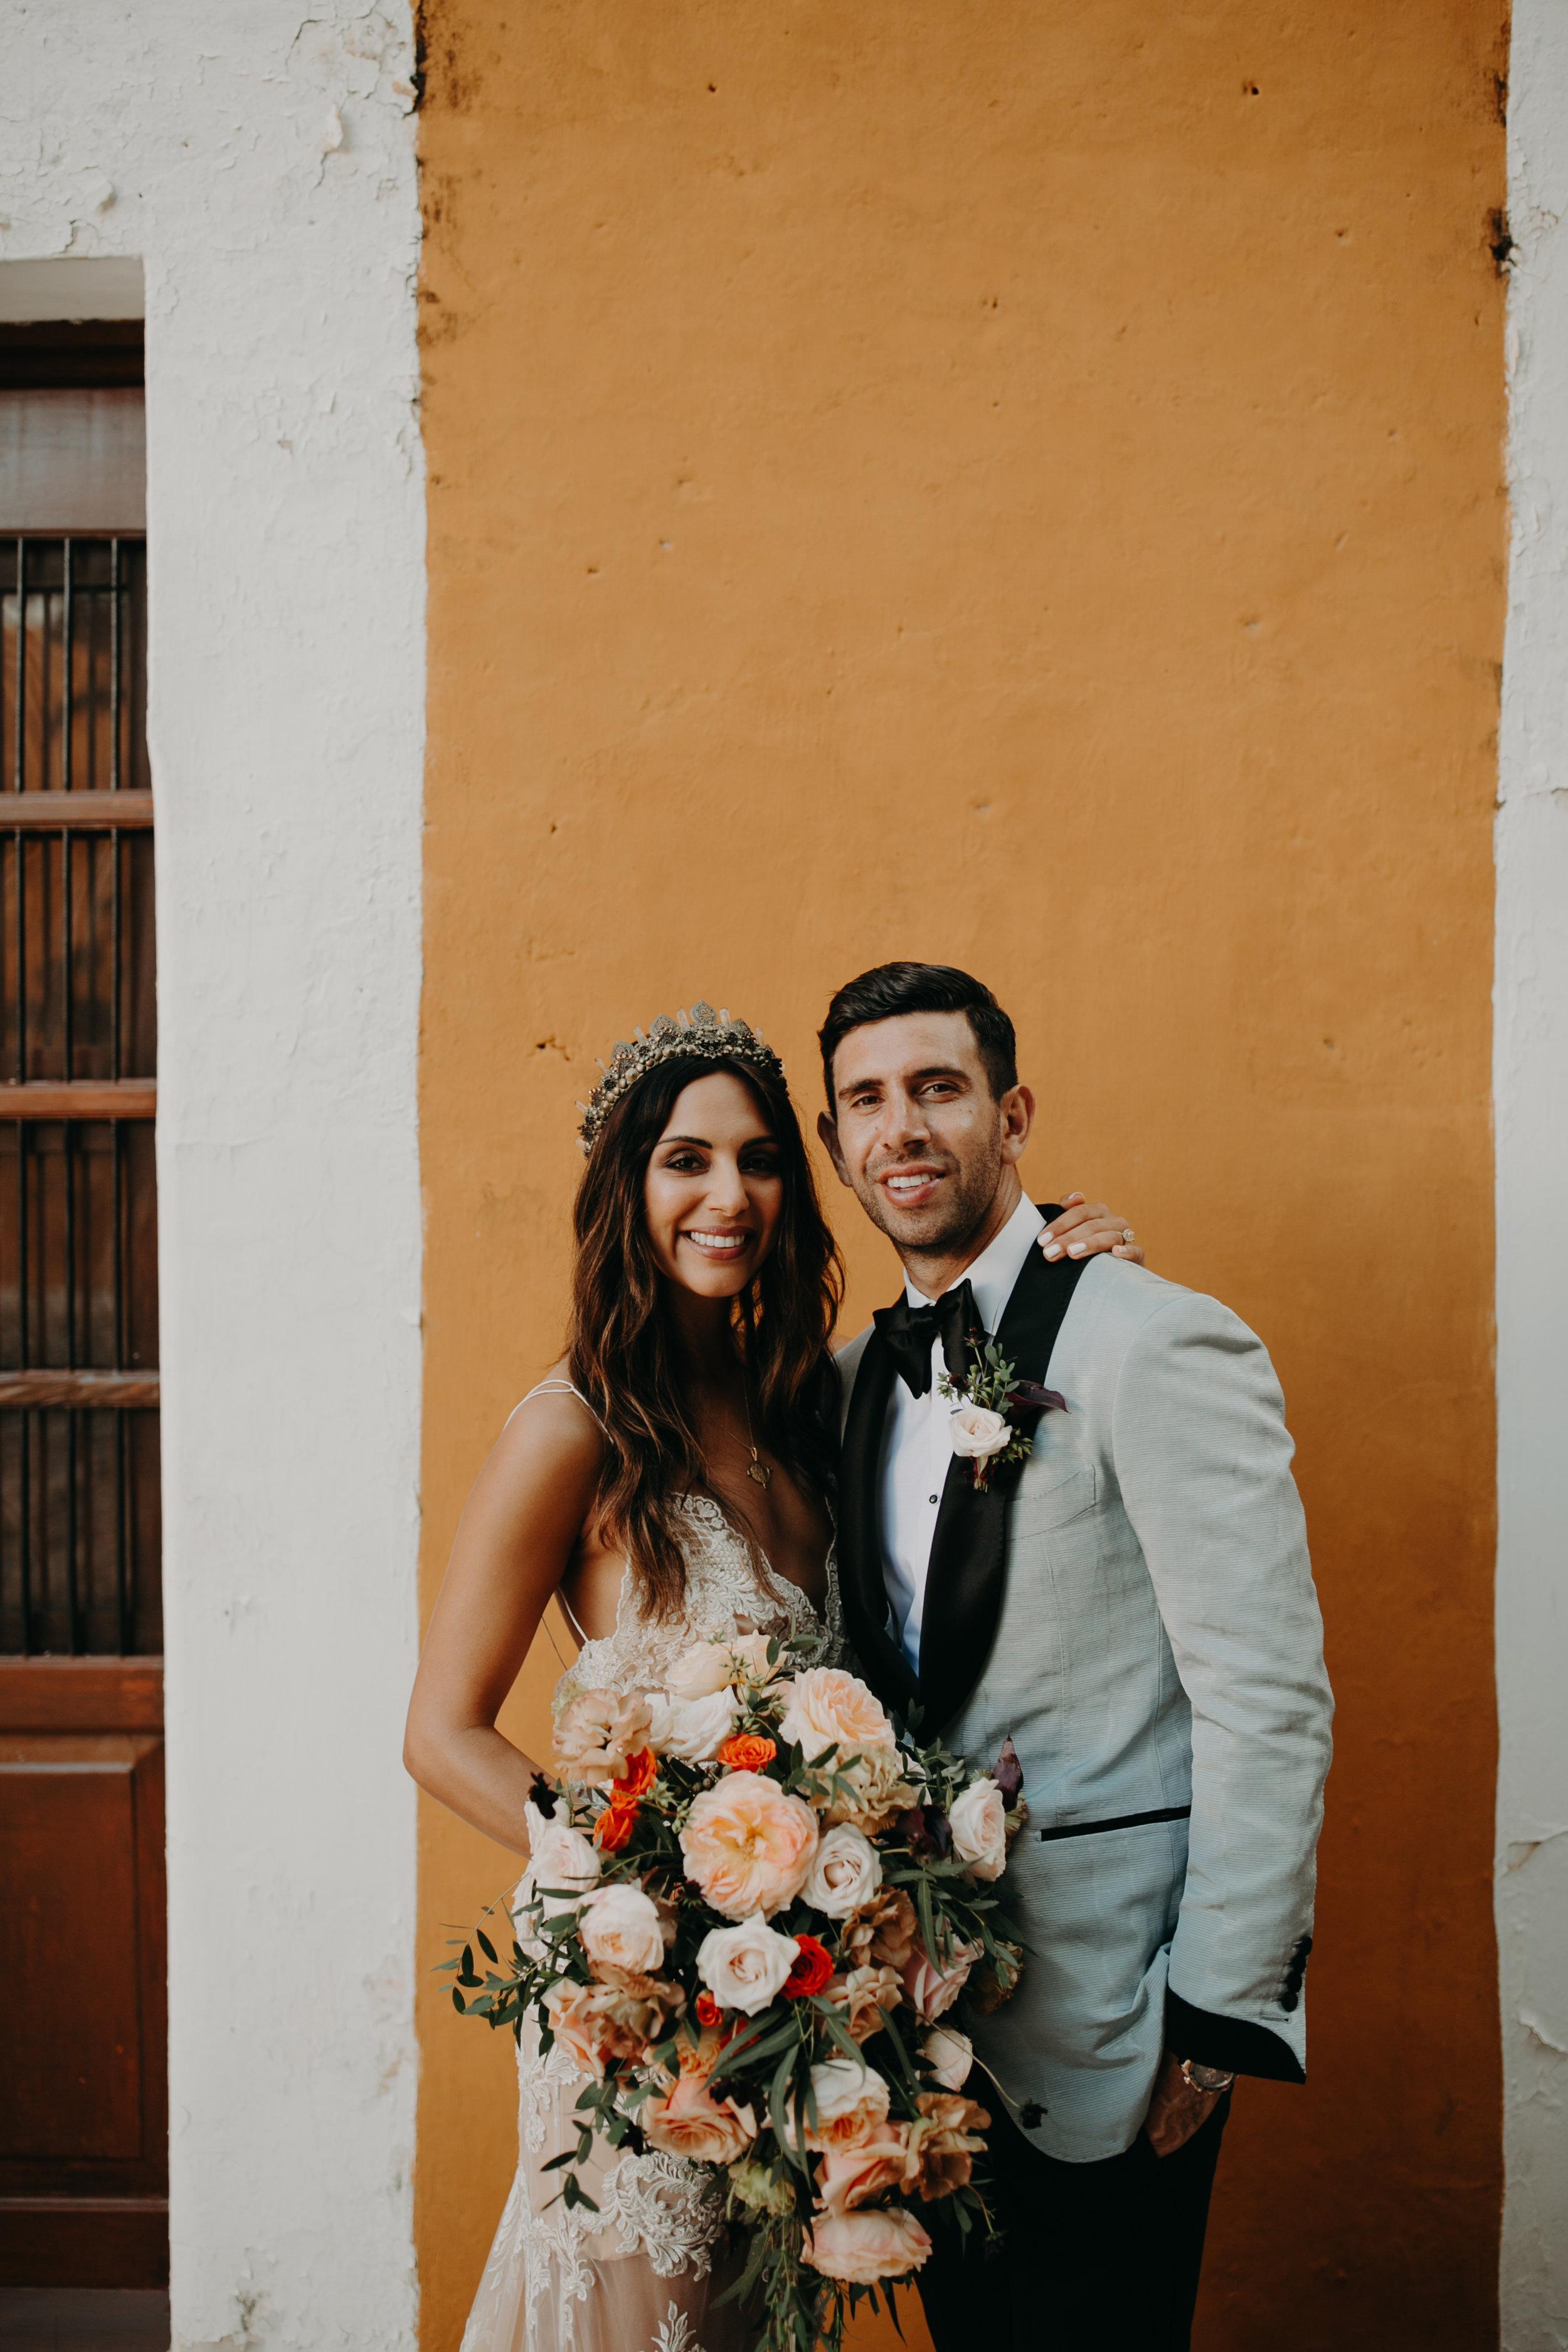 Hacienda Temozon Yucatan Mexico Wedding | Ida & Peter Emily Magers Photography-572.jpg